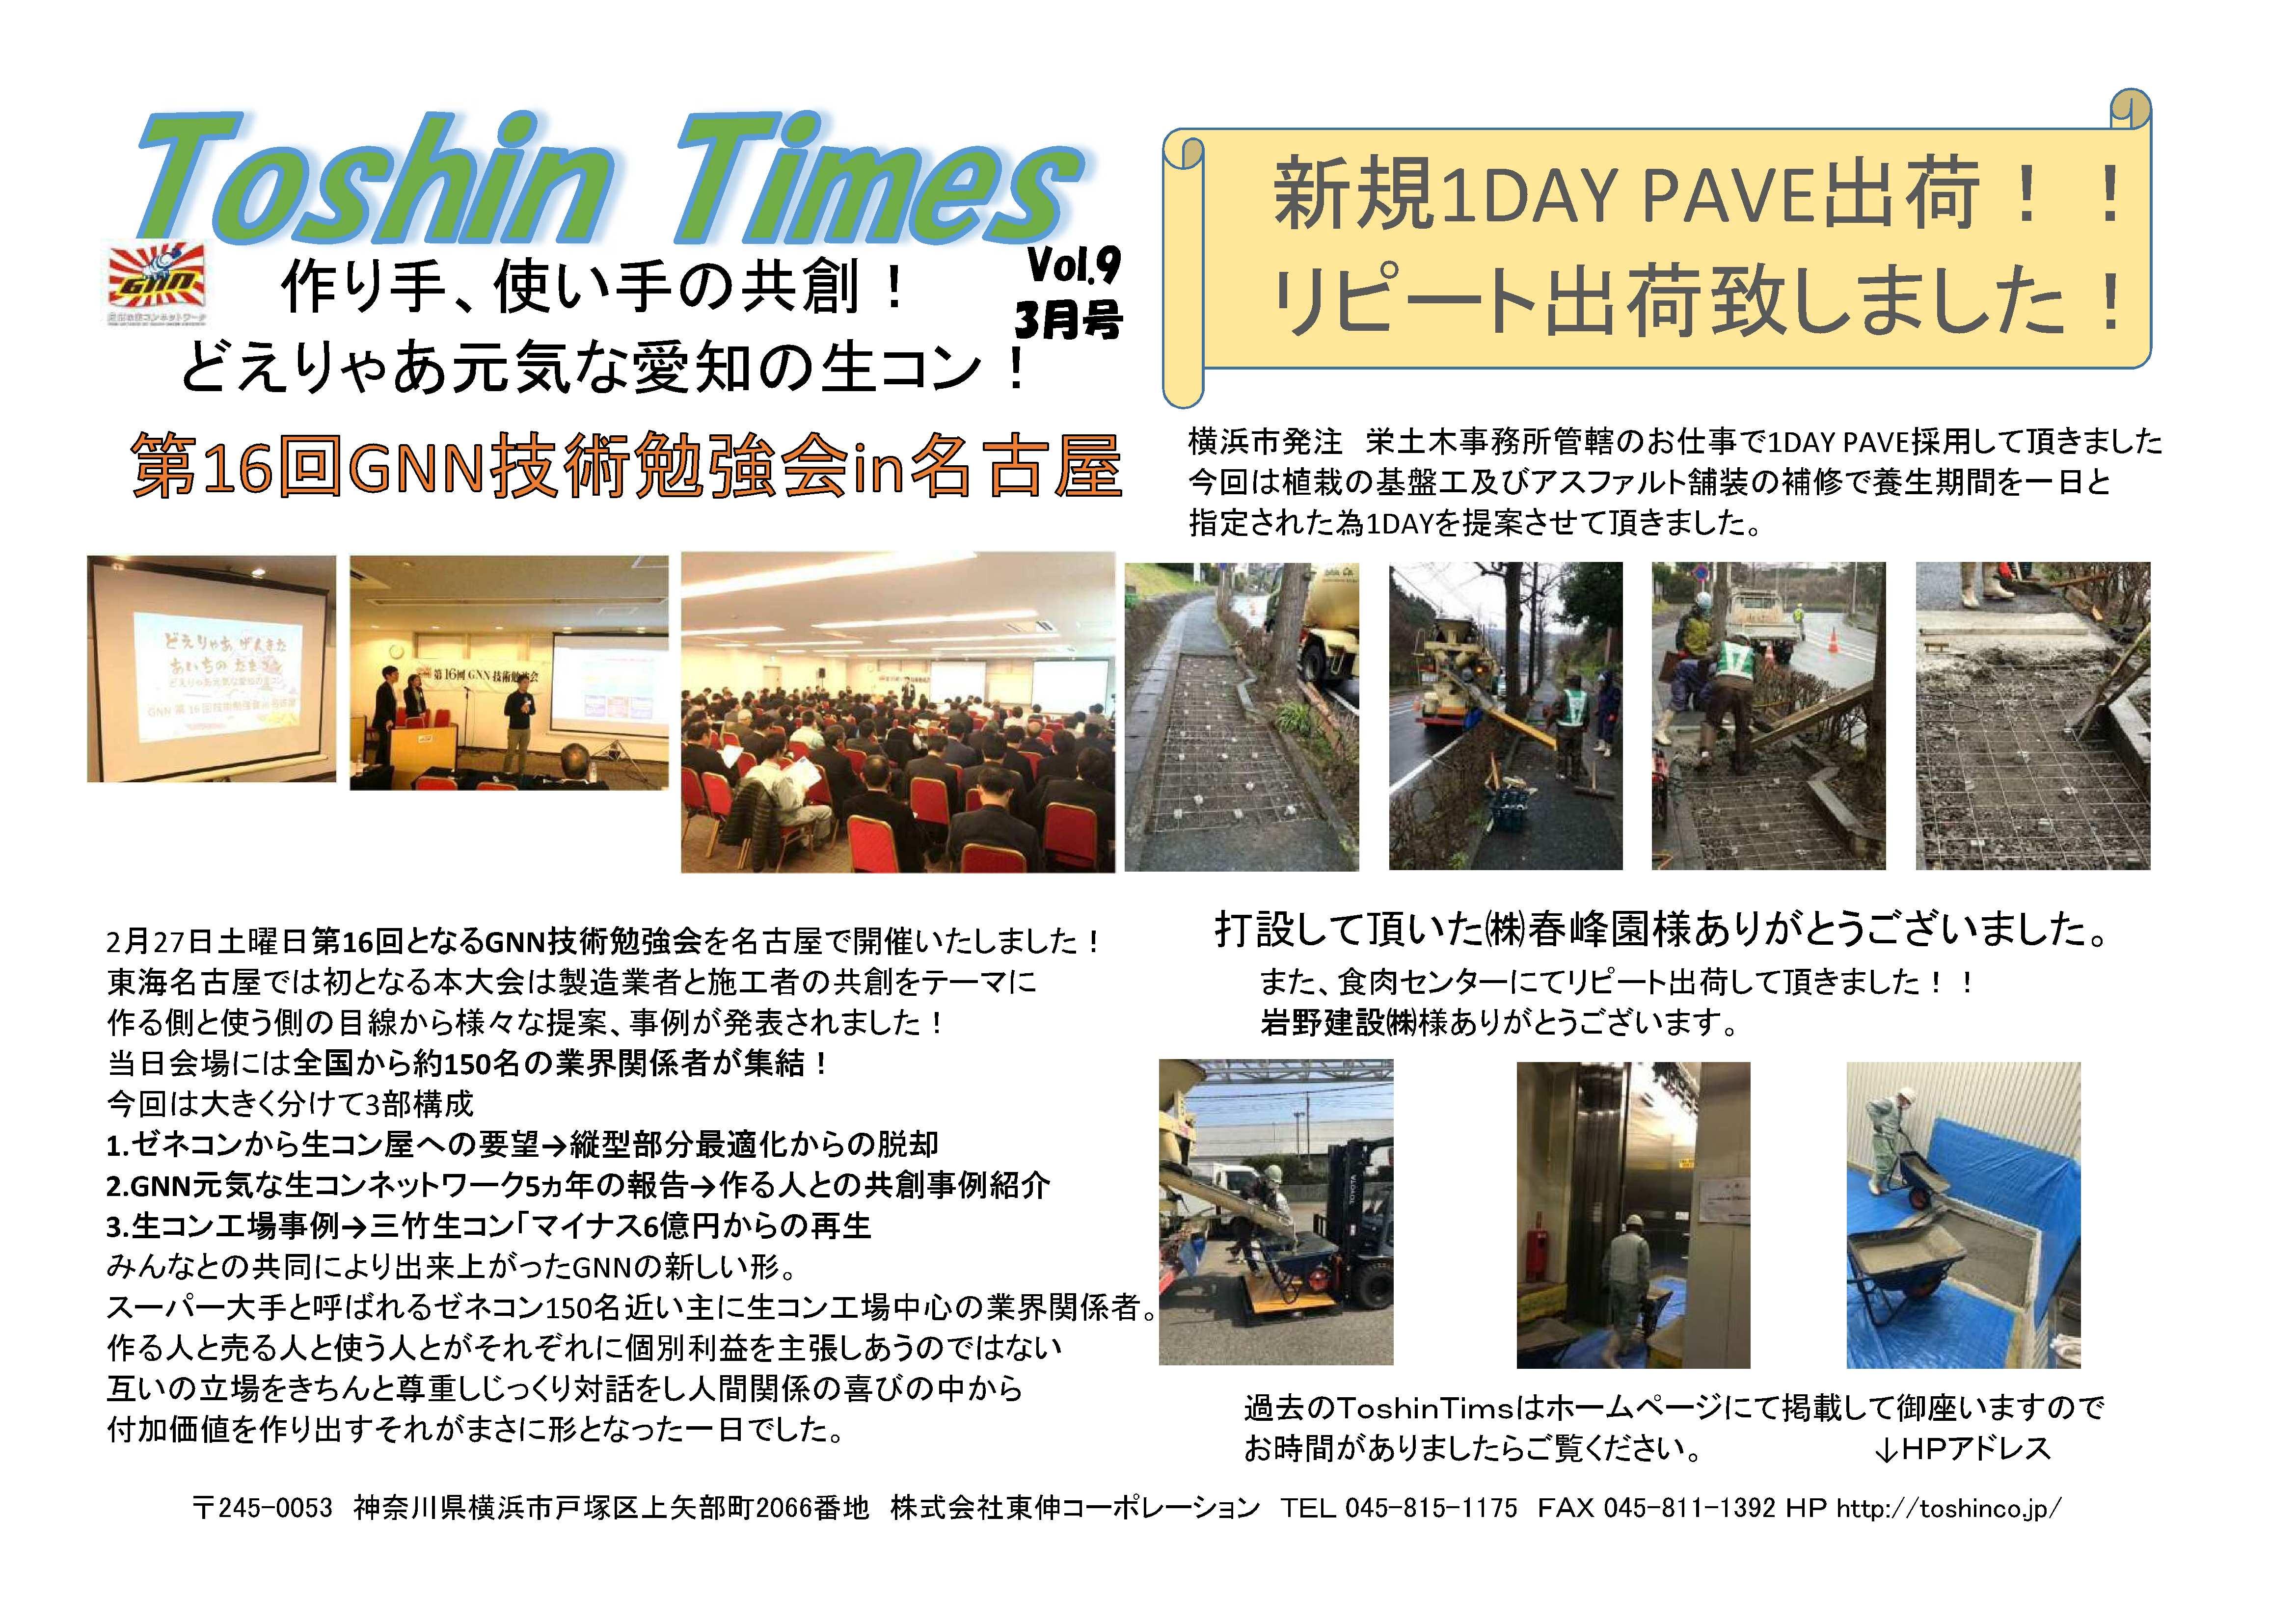 ToshinTimes vol.9